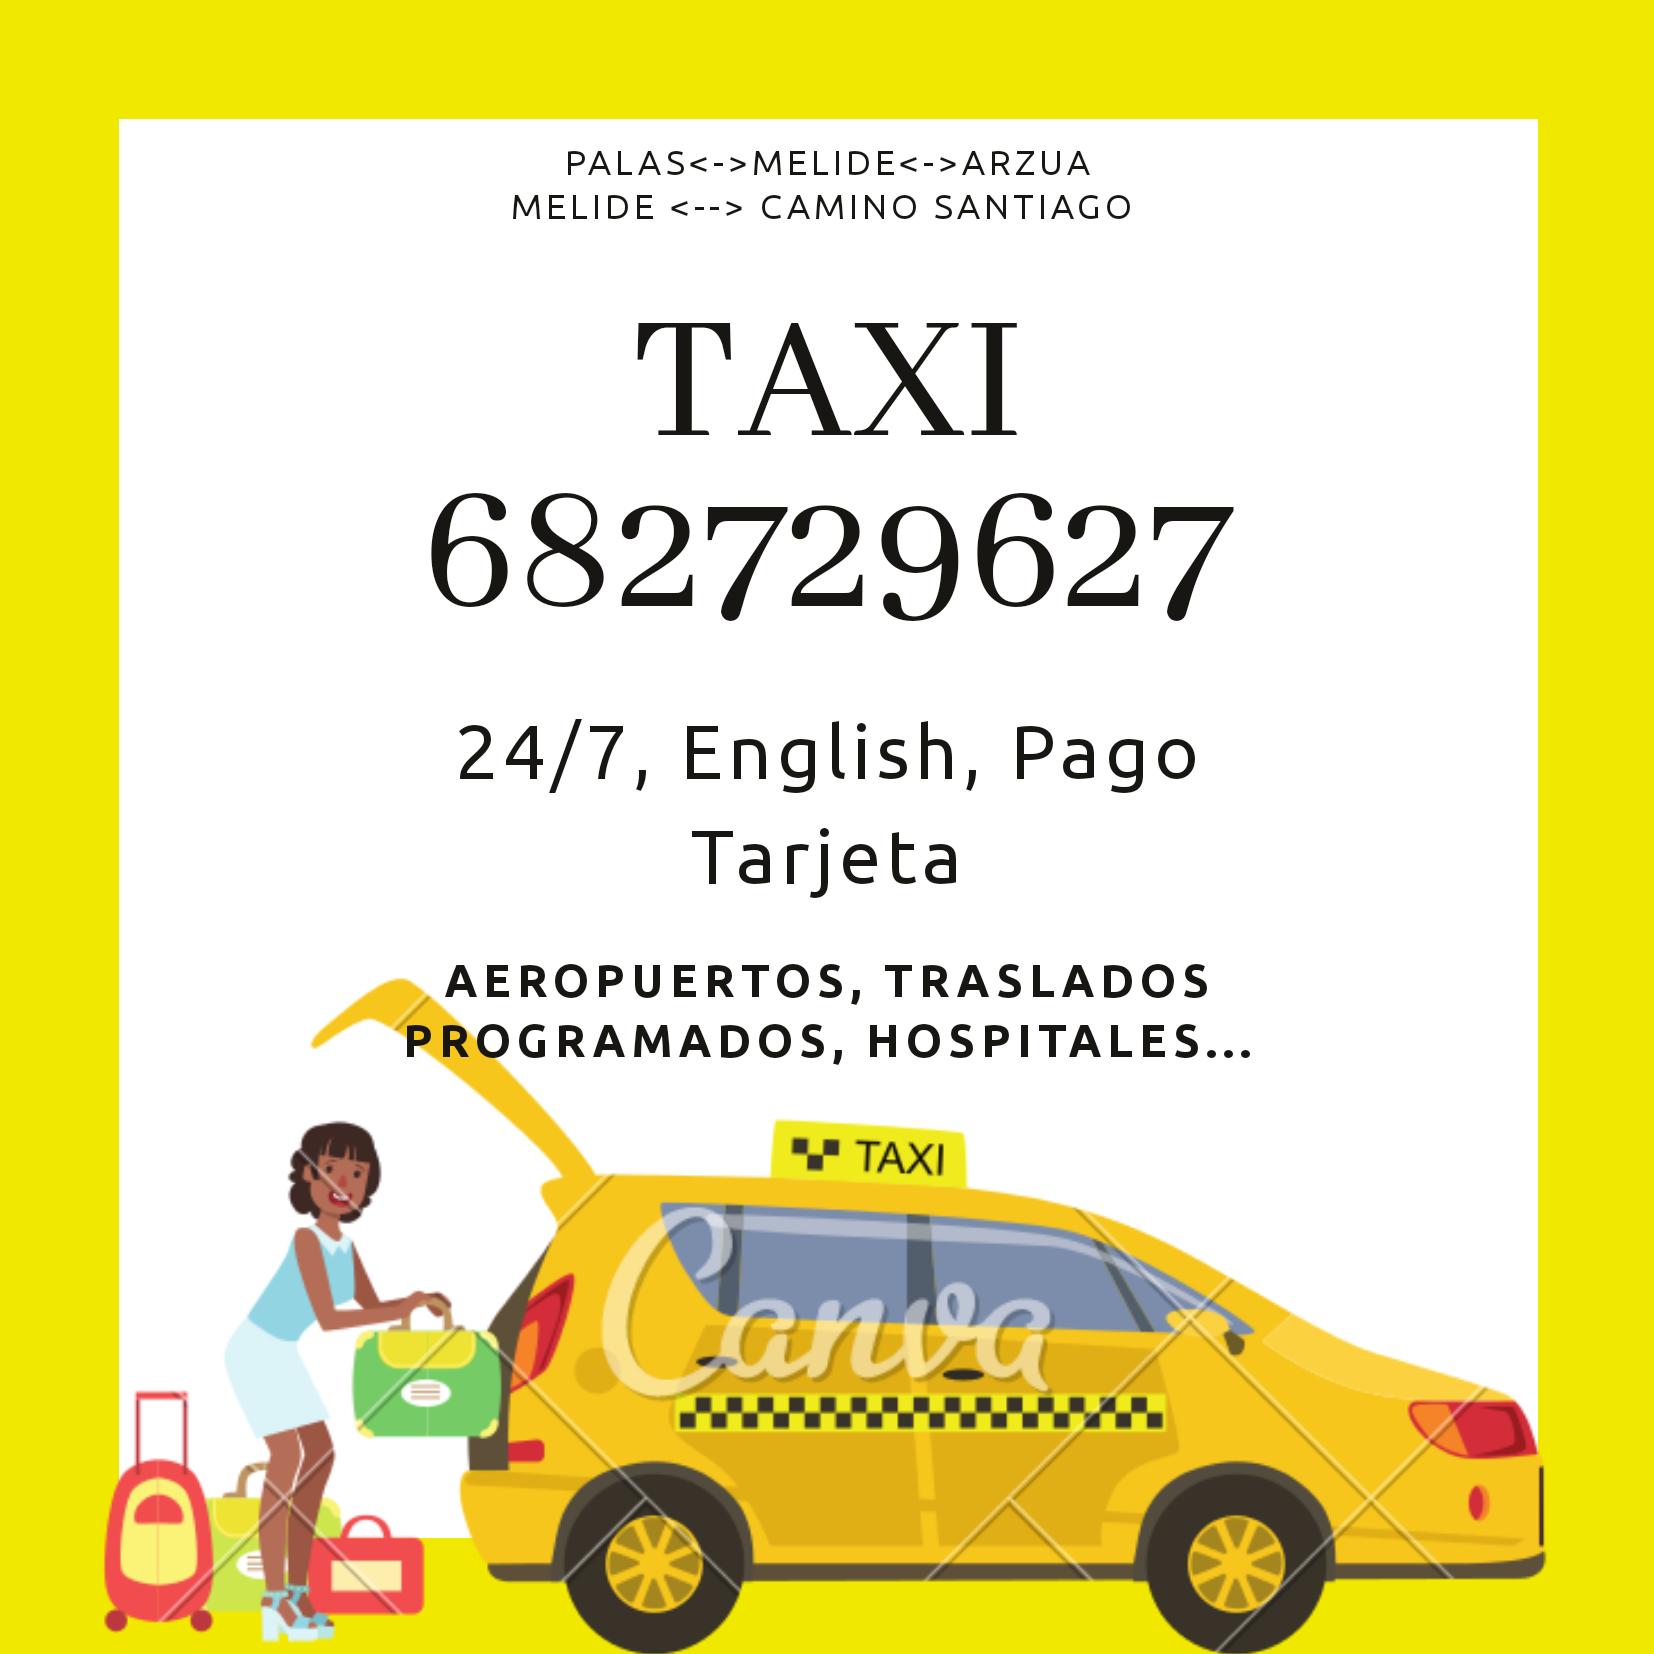 Taxi 24 Horas Melide (Taxi Vicente)